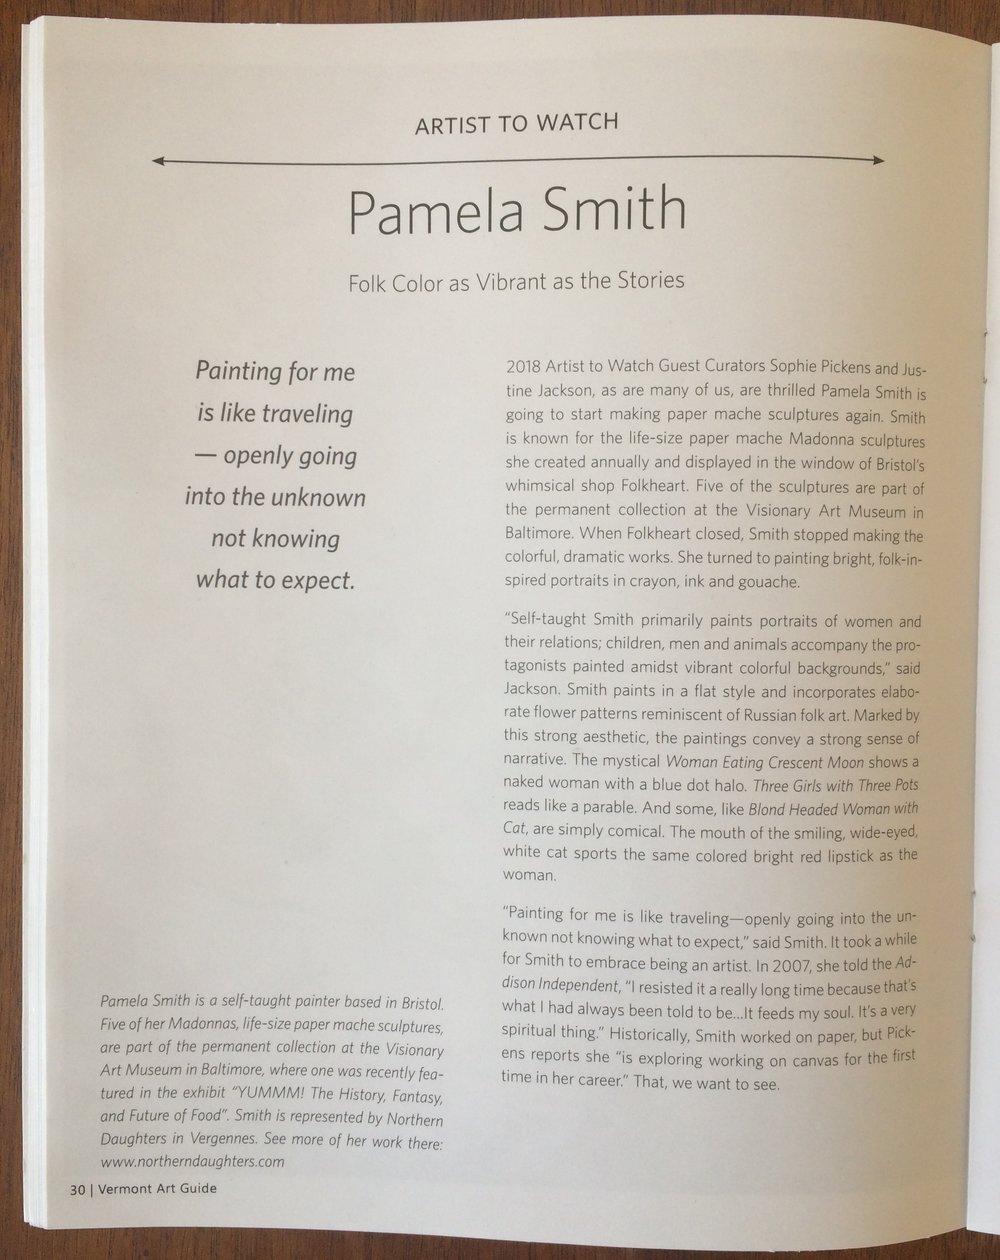 Pamela Smith Vermont Art Guide